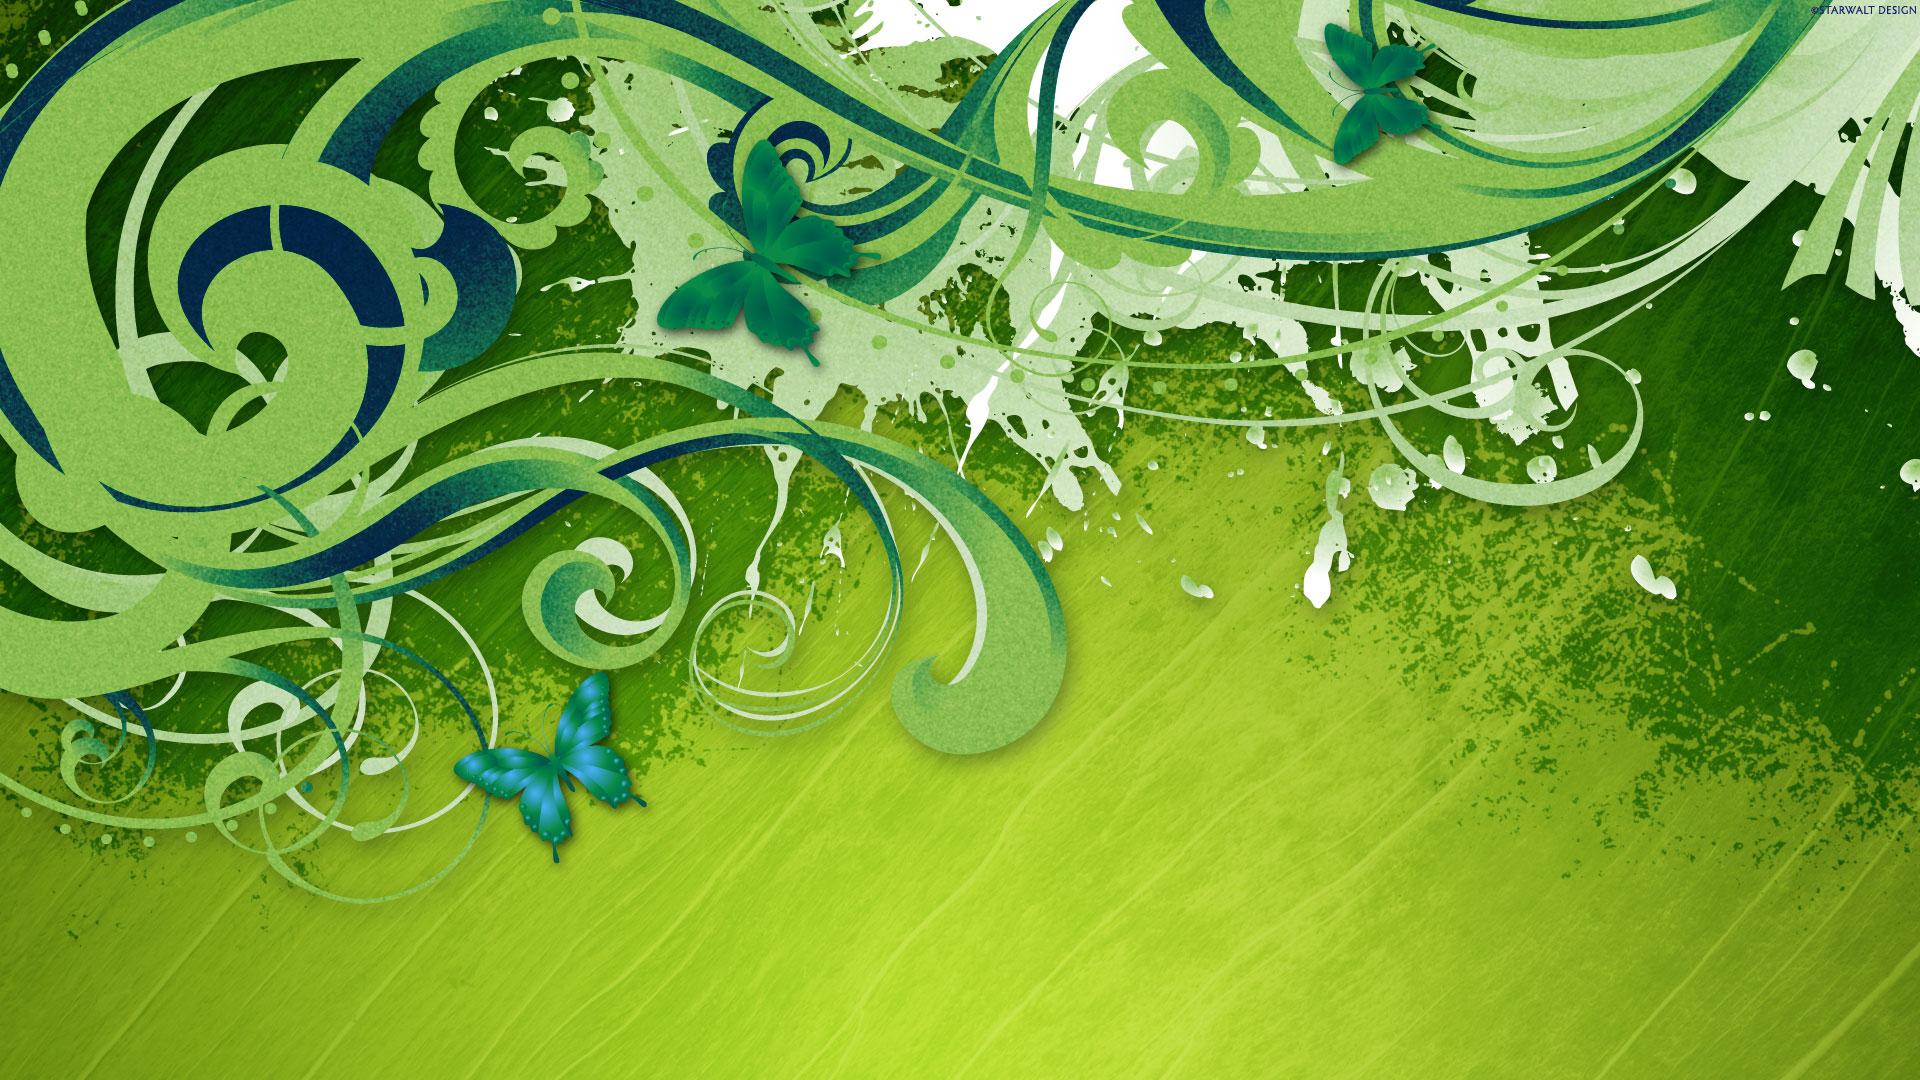 HD Wallpapers Green Vector HDTV